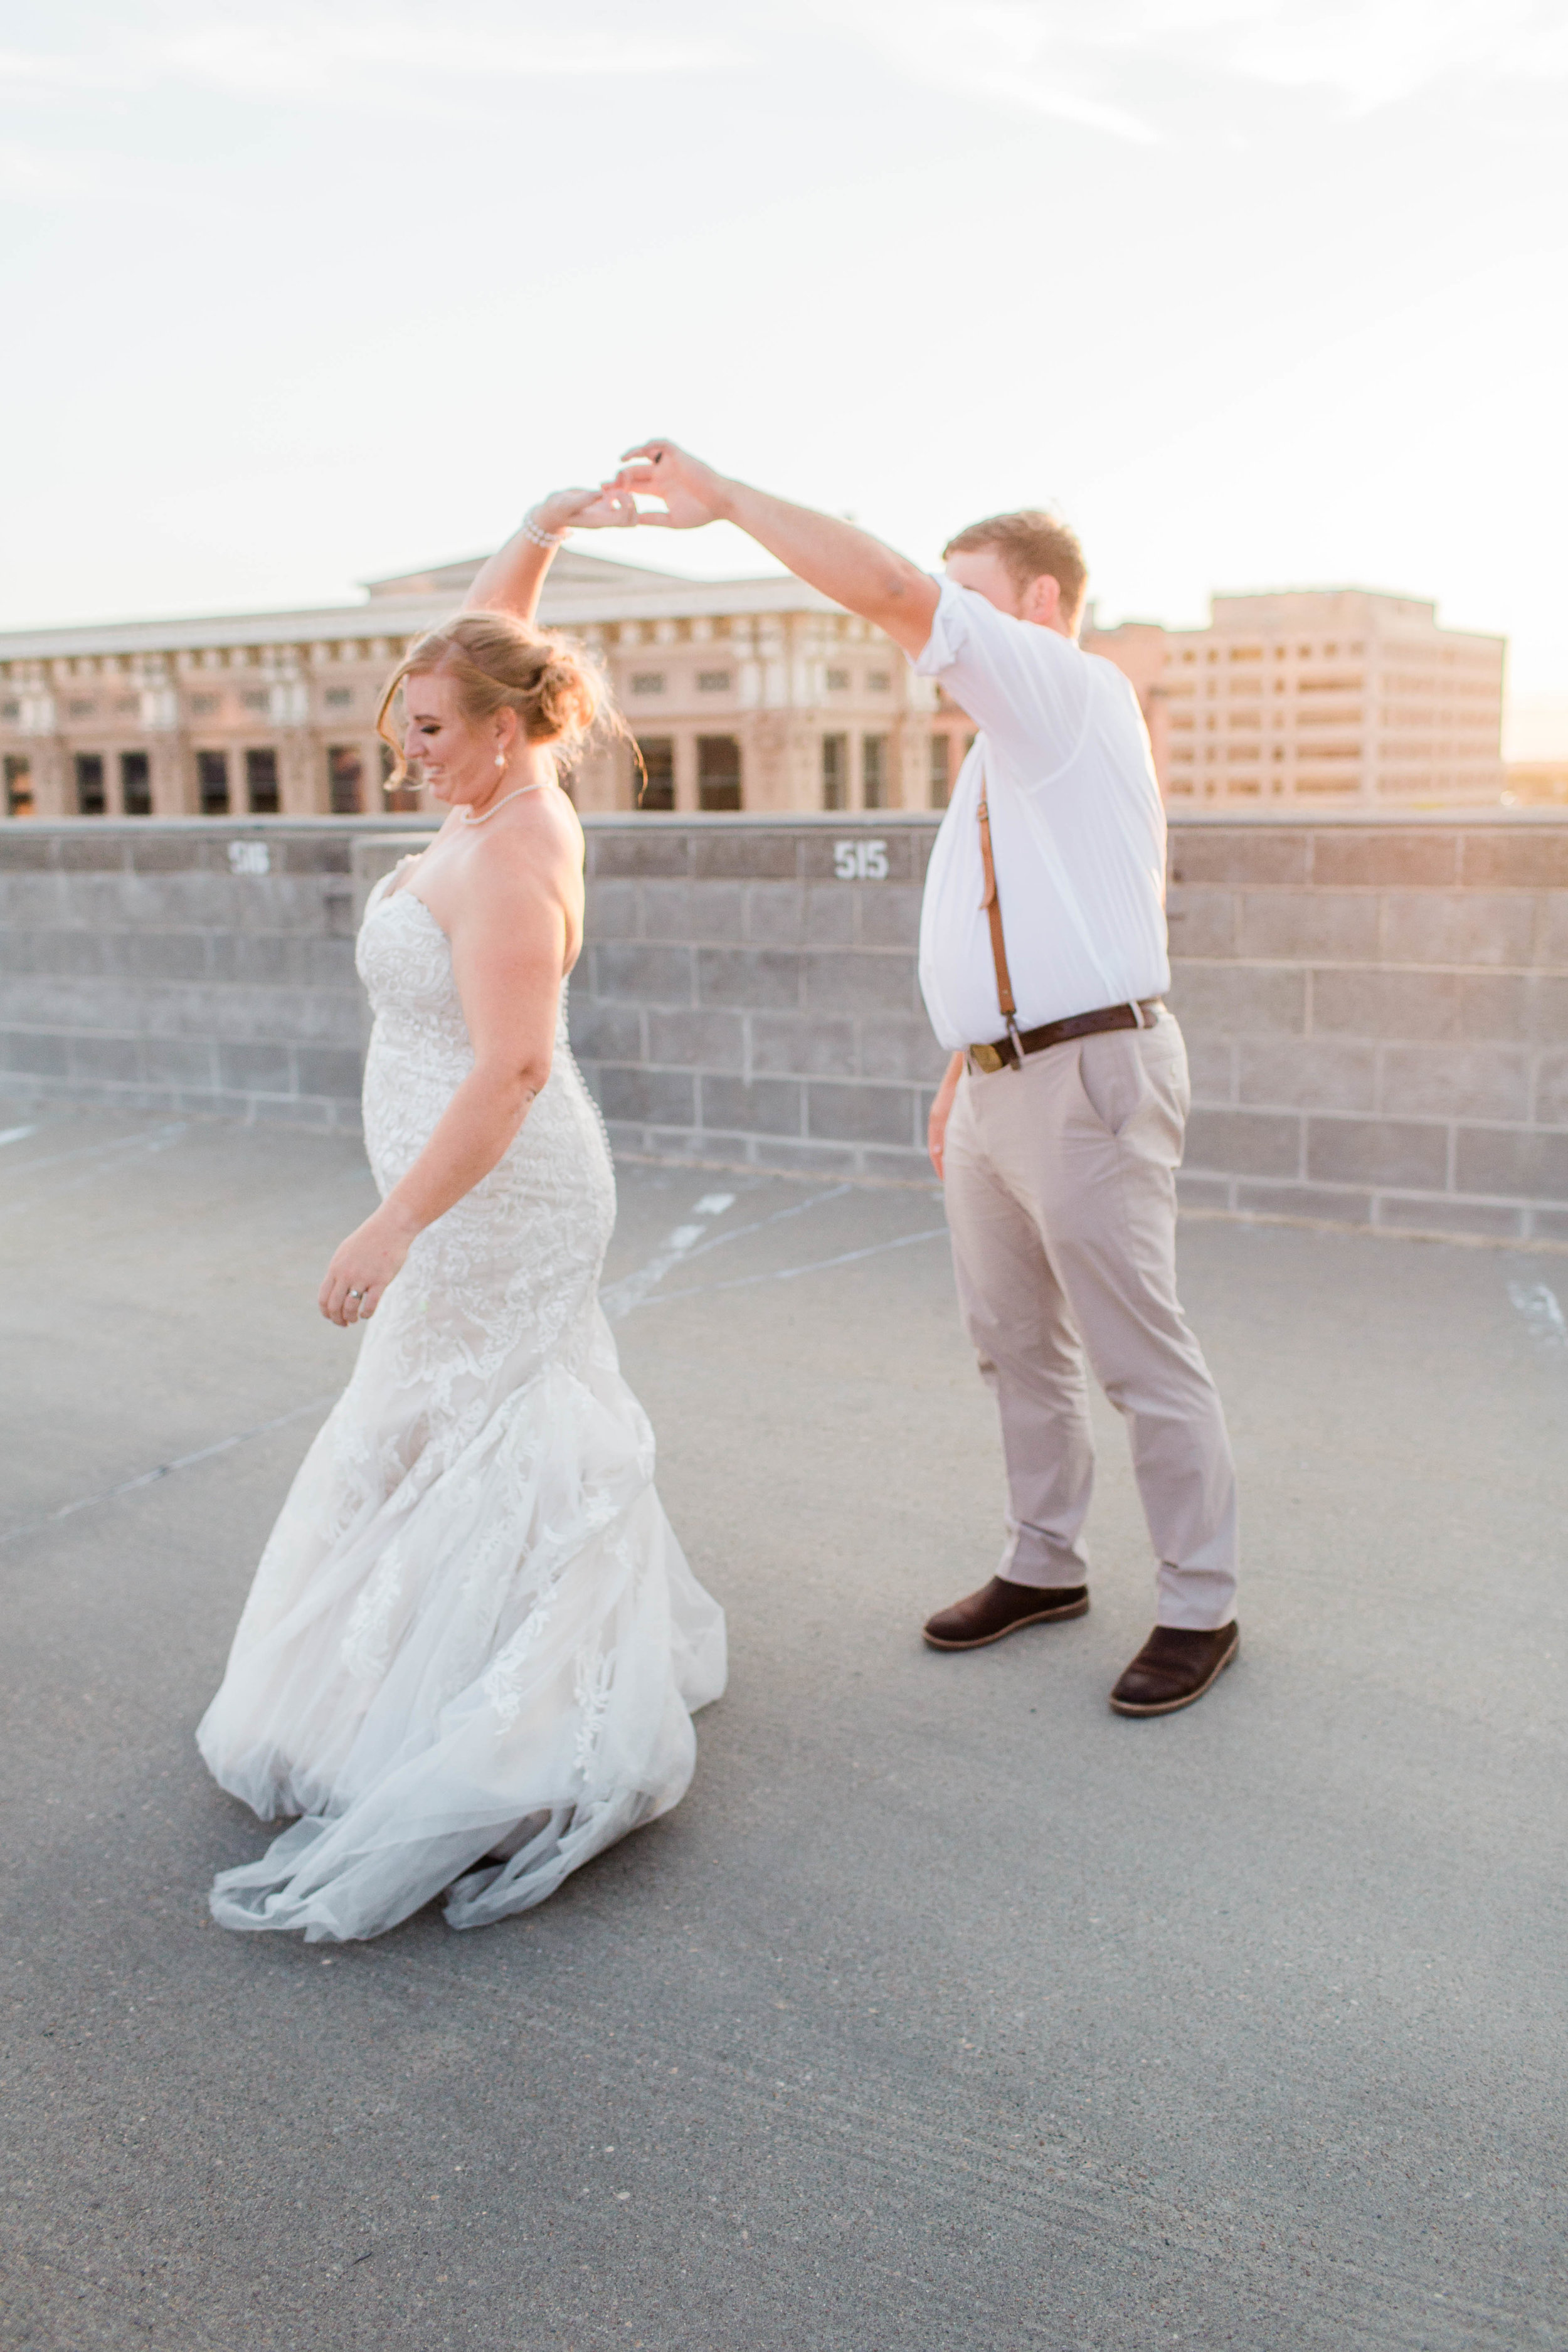 E-Lydia-Rohan-Downtown-Boise-Wedding-14.jpg